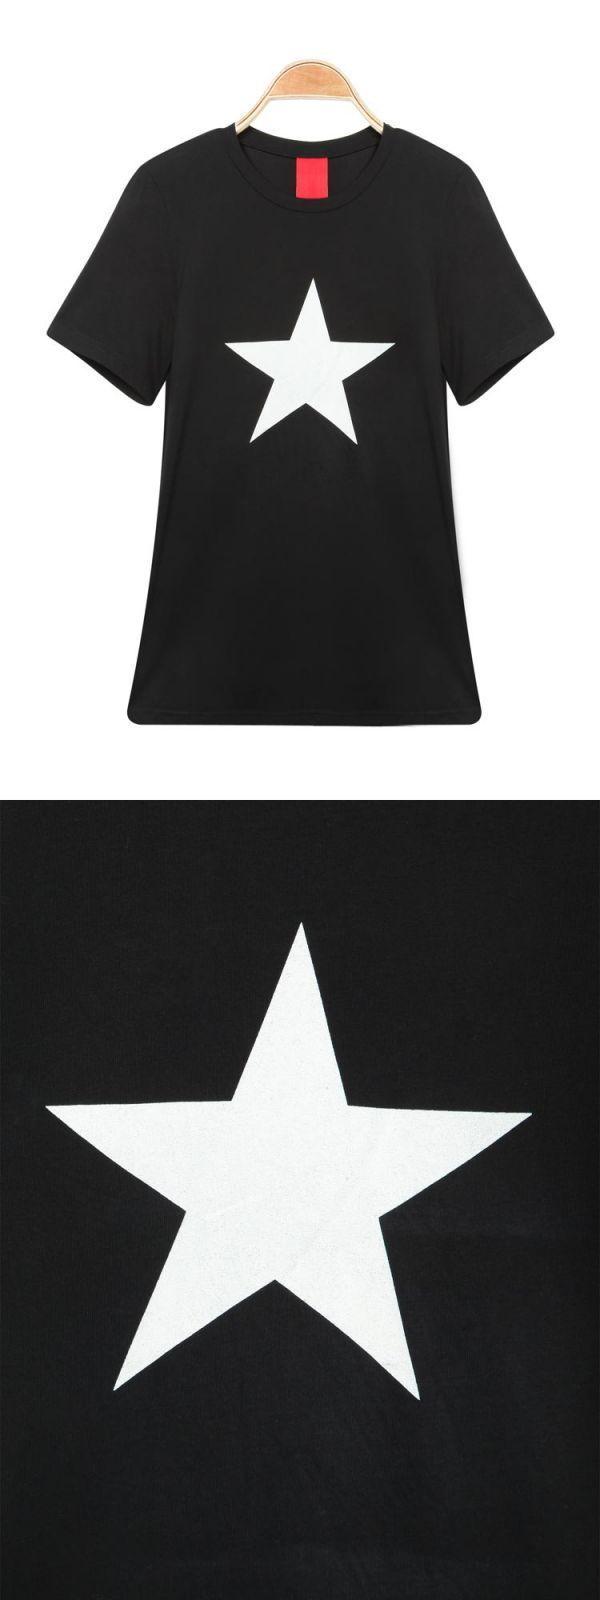 T shirt model woman solid color o-neck short sleeve star print t-shirt #gap #womens #t #shirts #uk #high #quality #womens #t #shirts #t #shirt #blank #girl #t #shirt #spider #woman